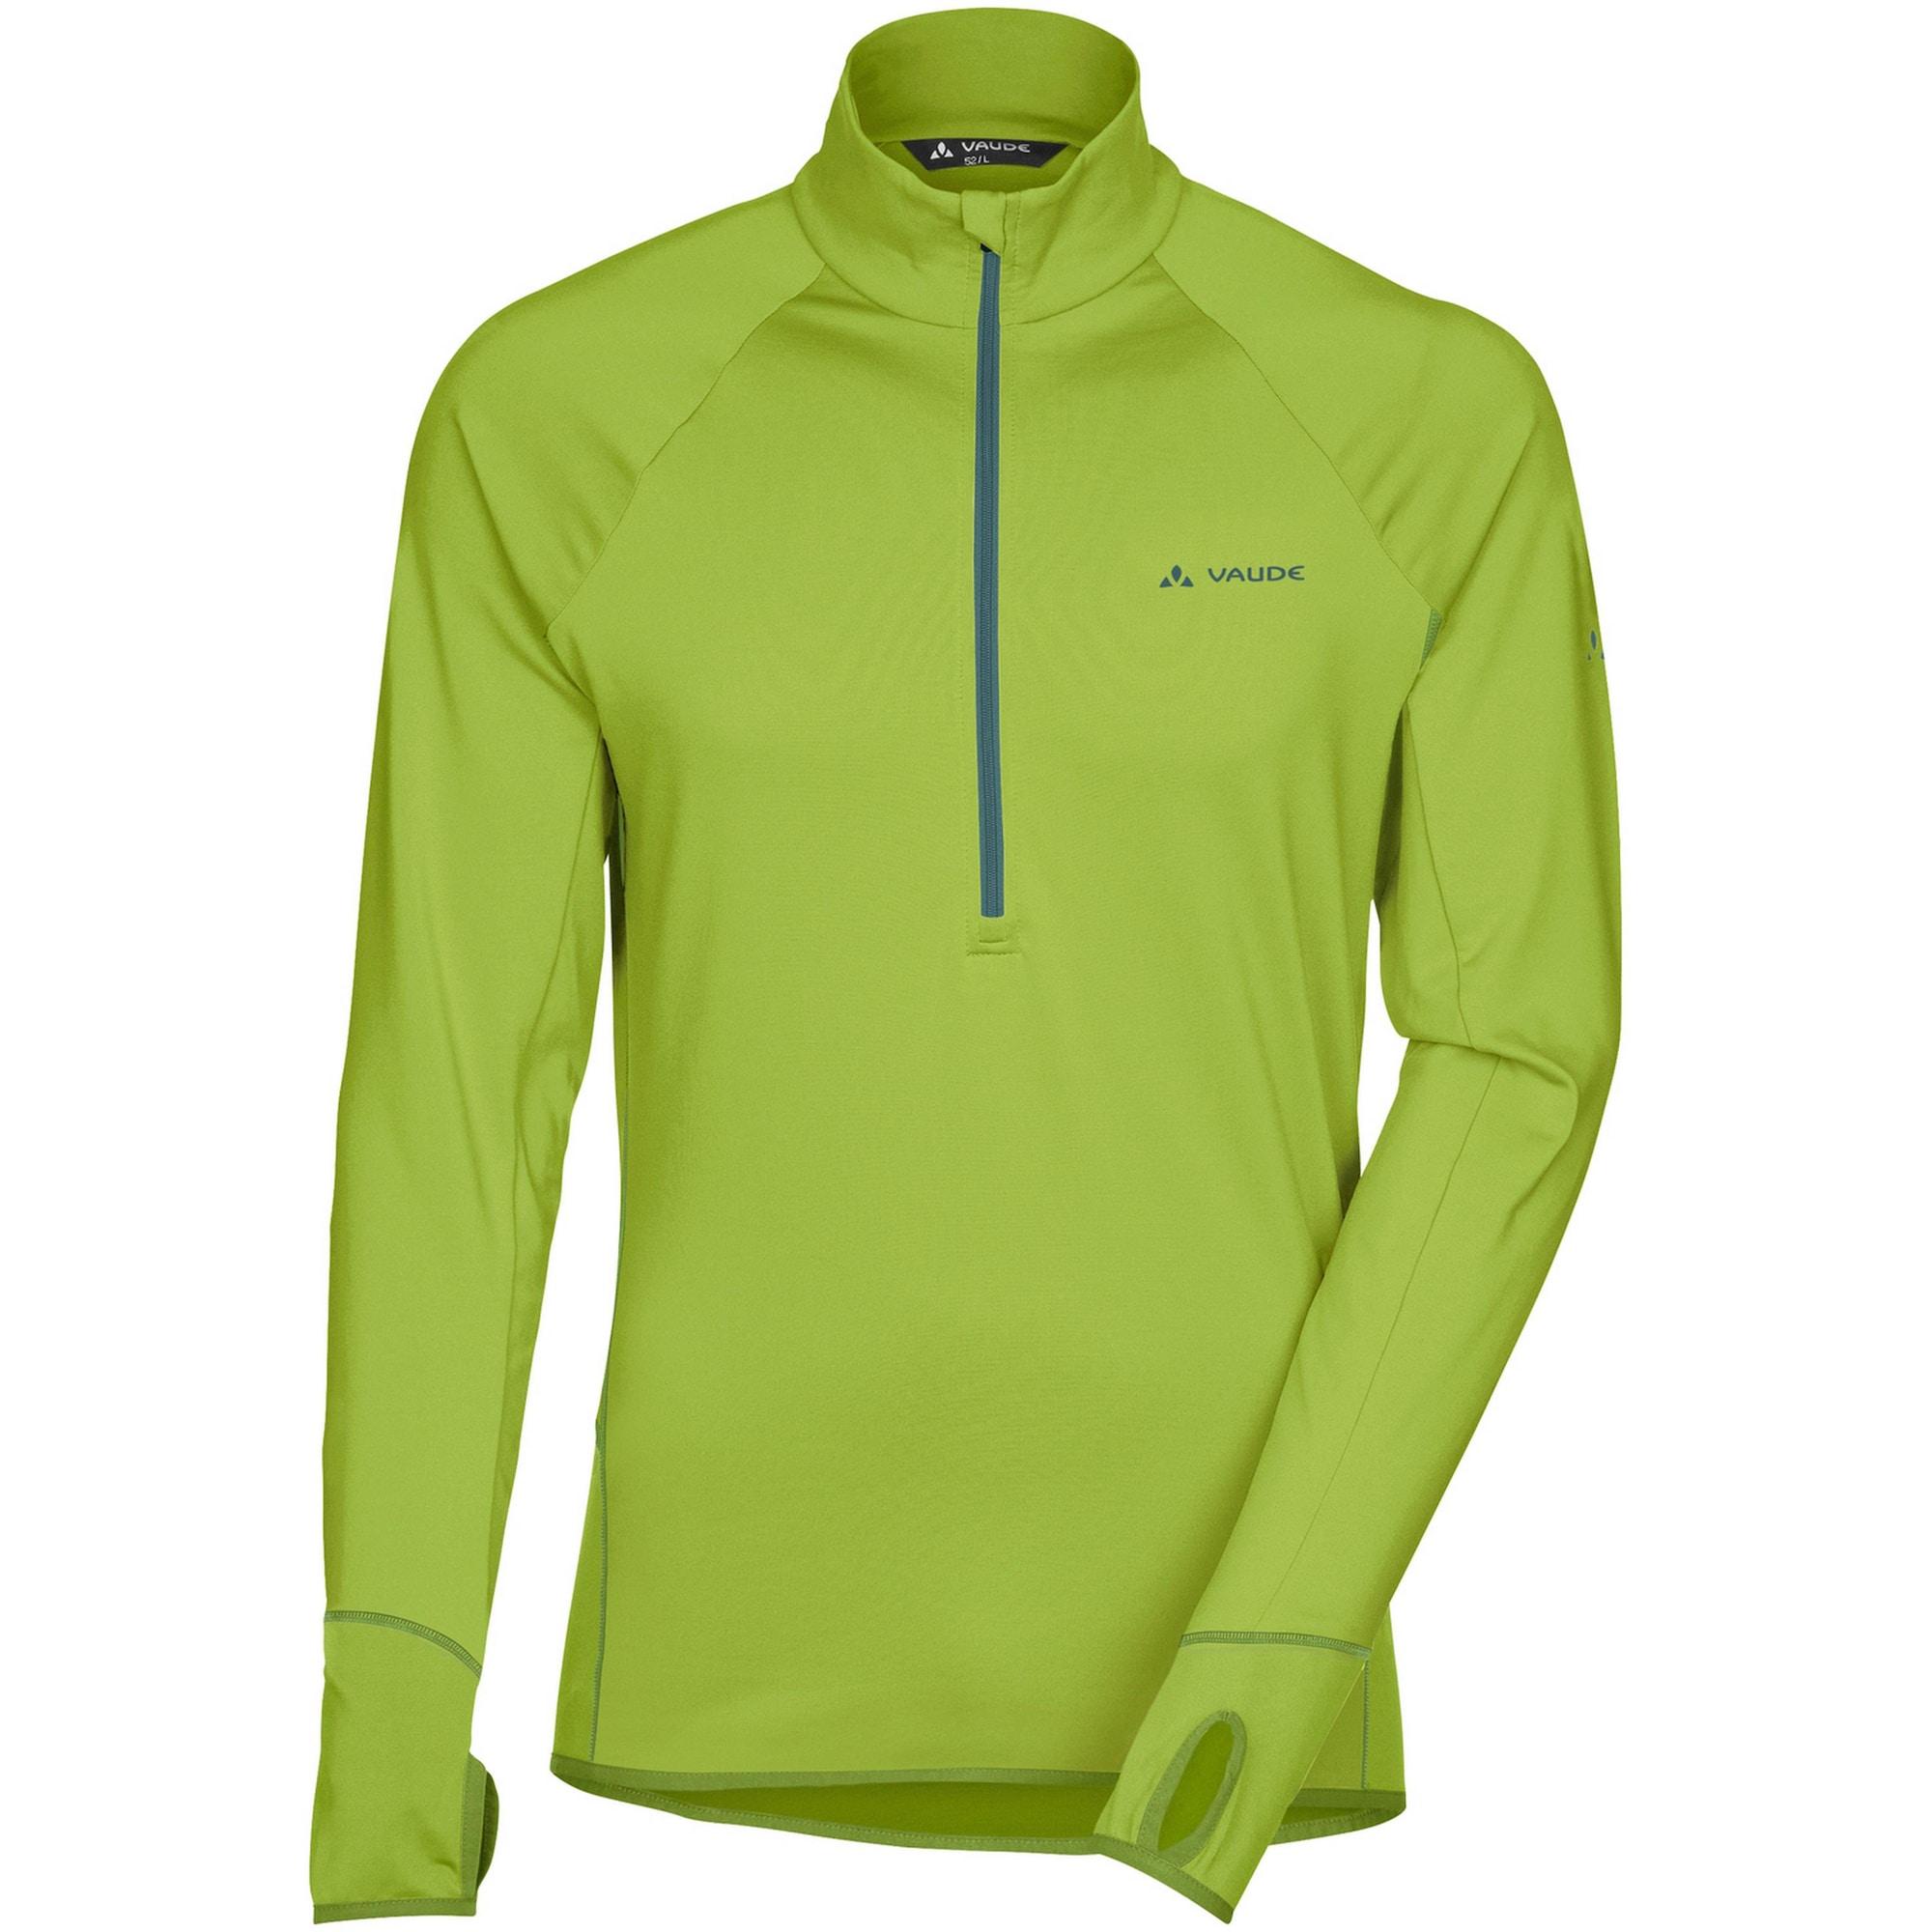 Fleecepullover 'Livigno' | Sportbekleidung | Vaude